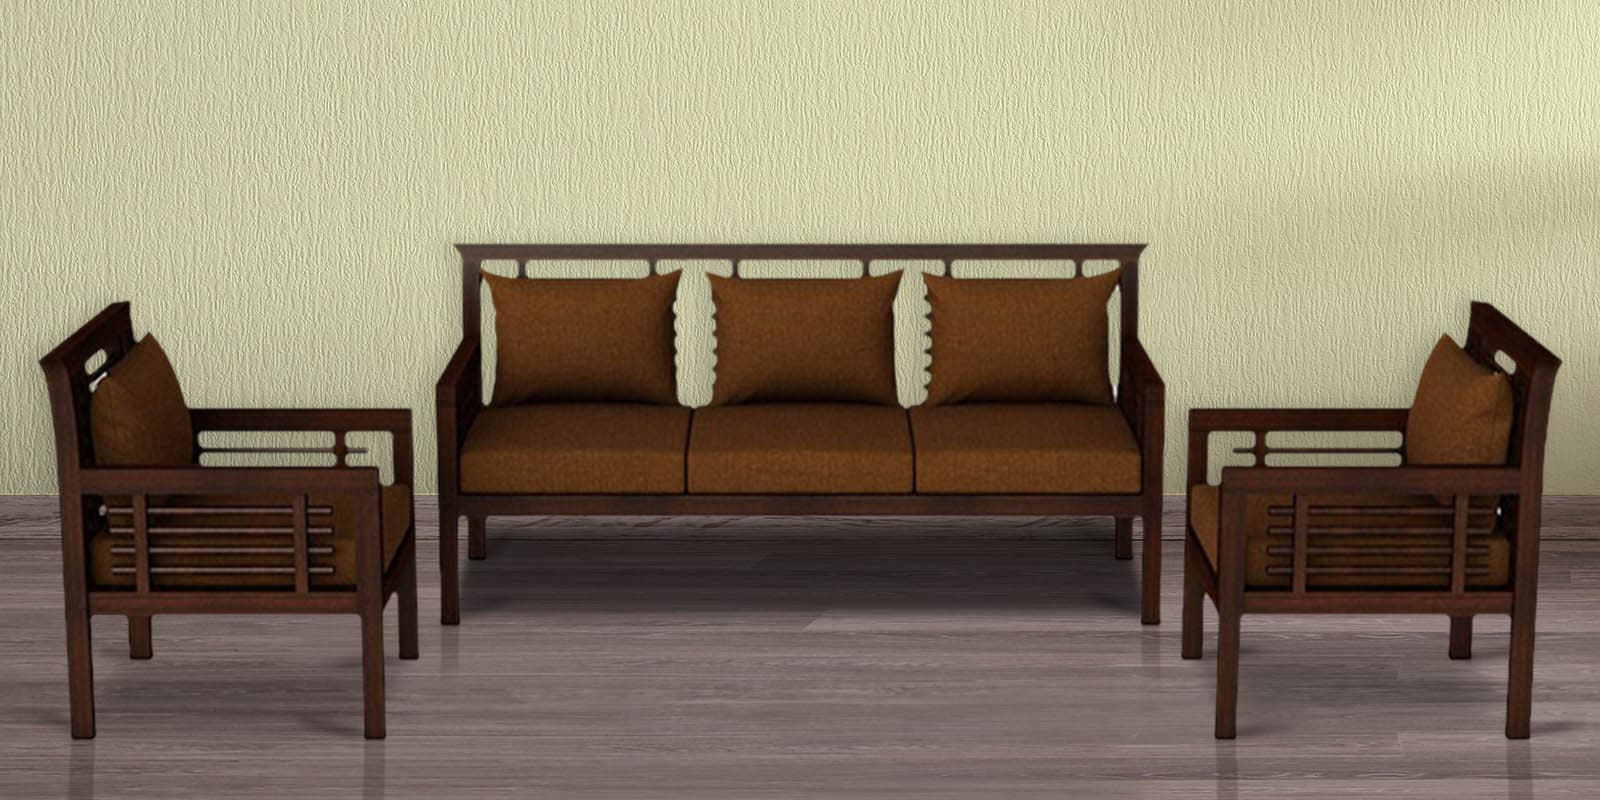 Buy Madison Teak Wood Sofa Set 3 1 1 In Mahogany Finish By Casateak Online Sofa Sets Sofa Sets Furniture Pepperfry Product